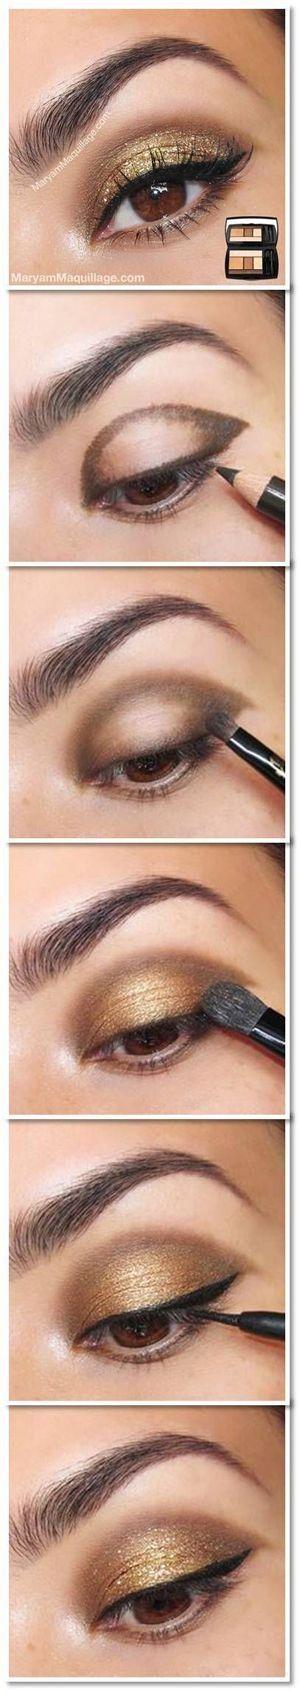 Holiday Gold Glitter Eye Makeup. Beauty Tips & Trips. by BeautifulBlueberryMuffin